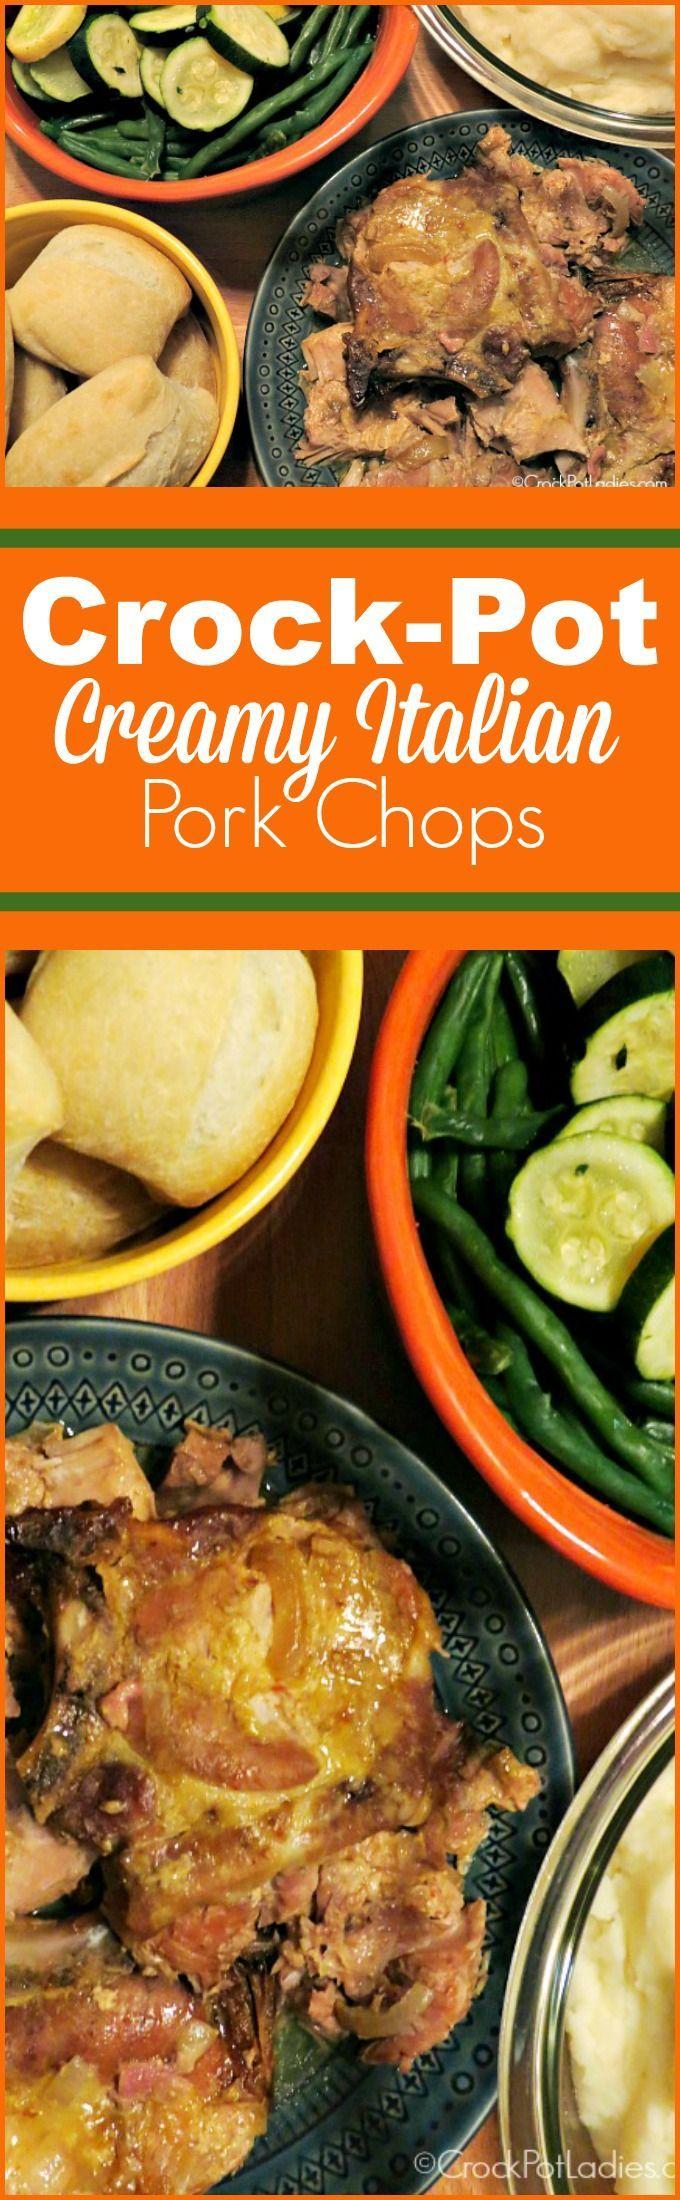 Crockpot Creamy Italian Pork Chops